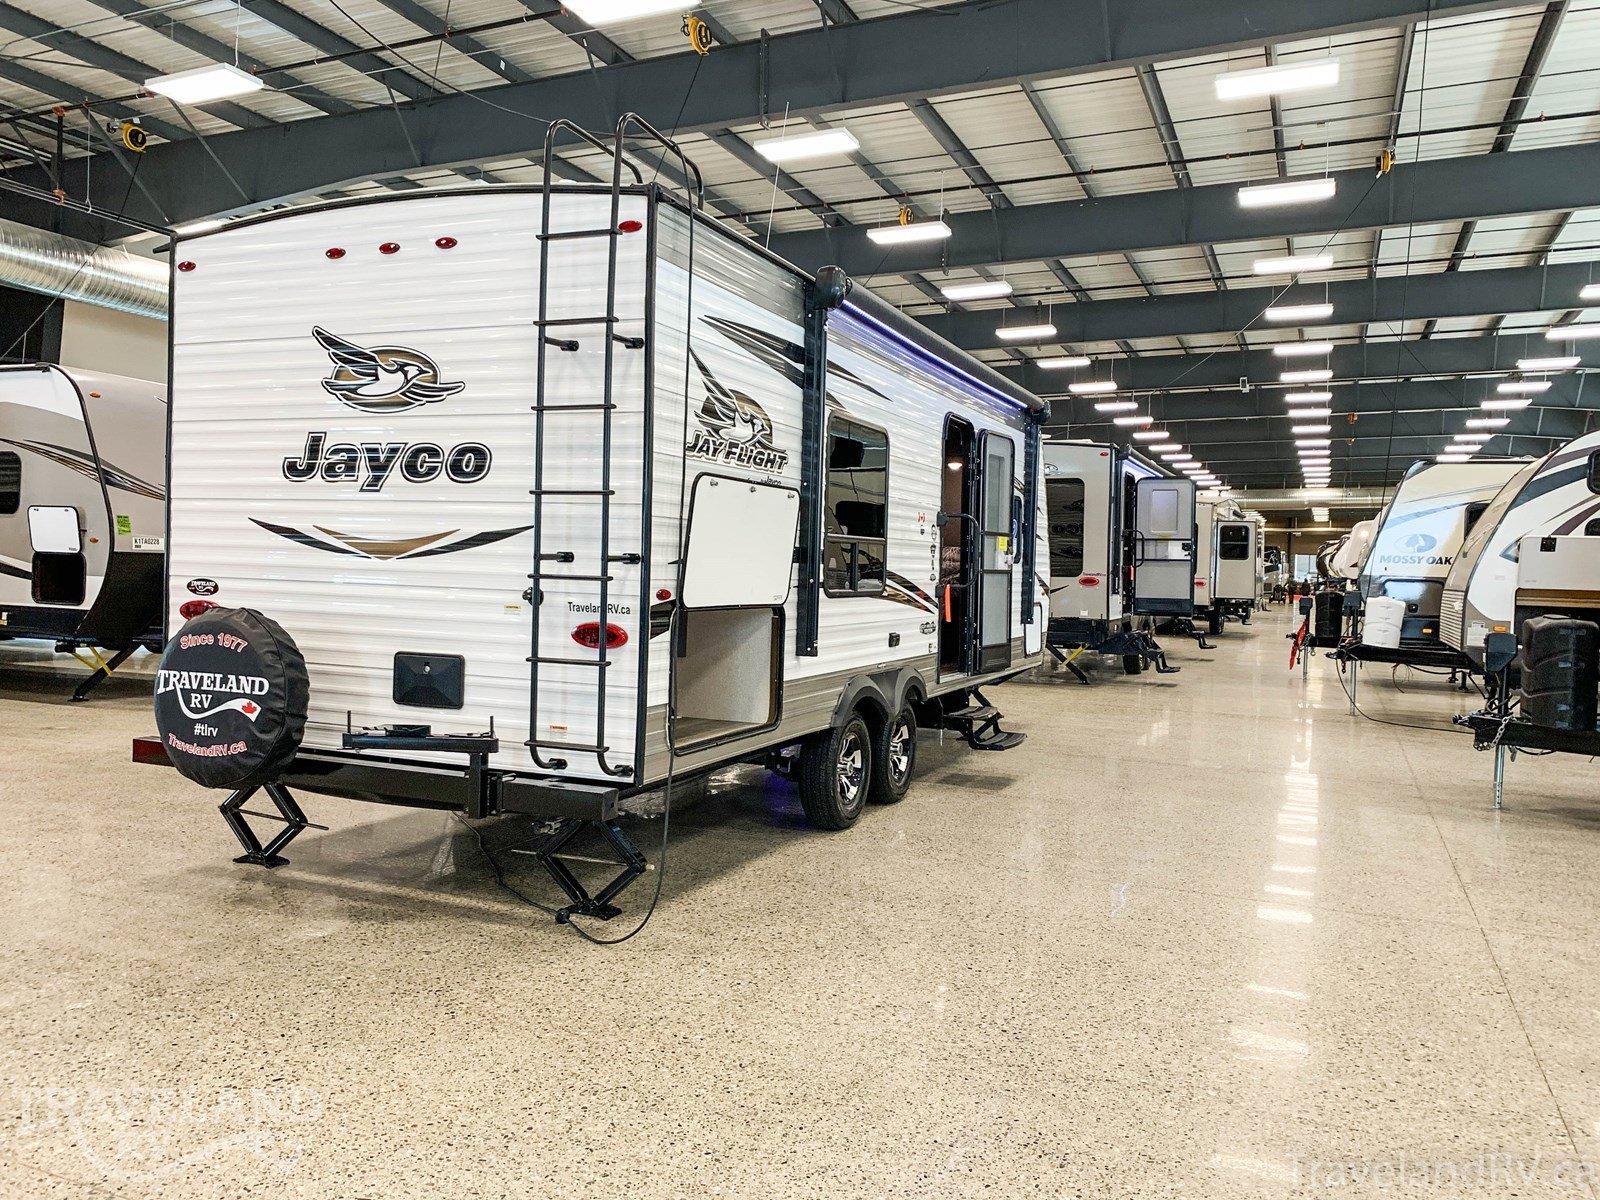 2018 Jayco Jayflight Rocky Mountain 232RBW Thumbnail